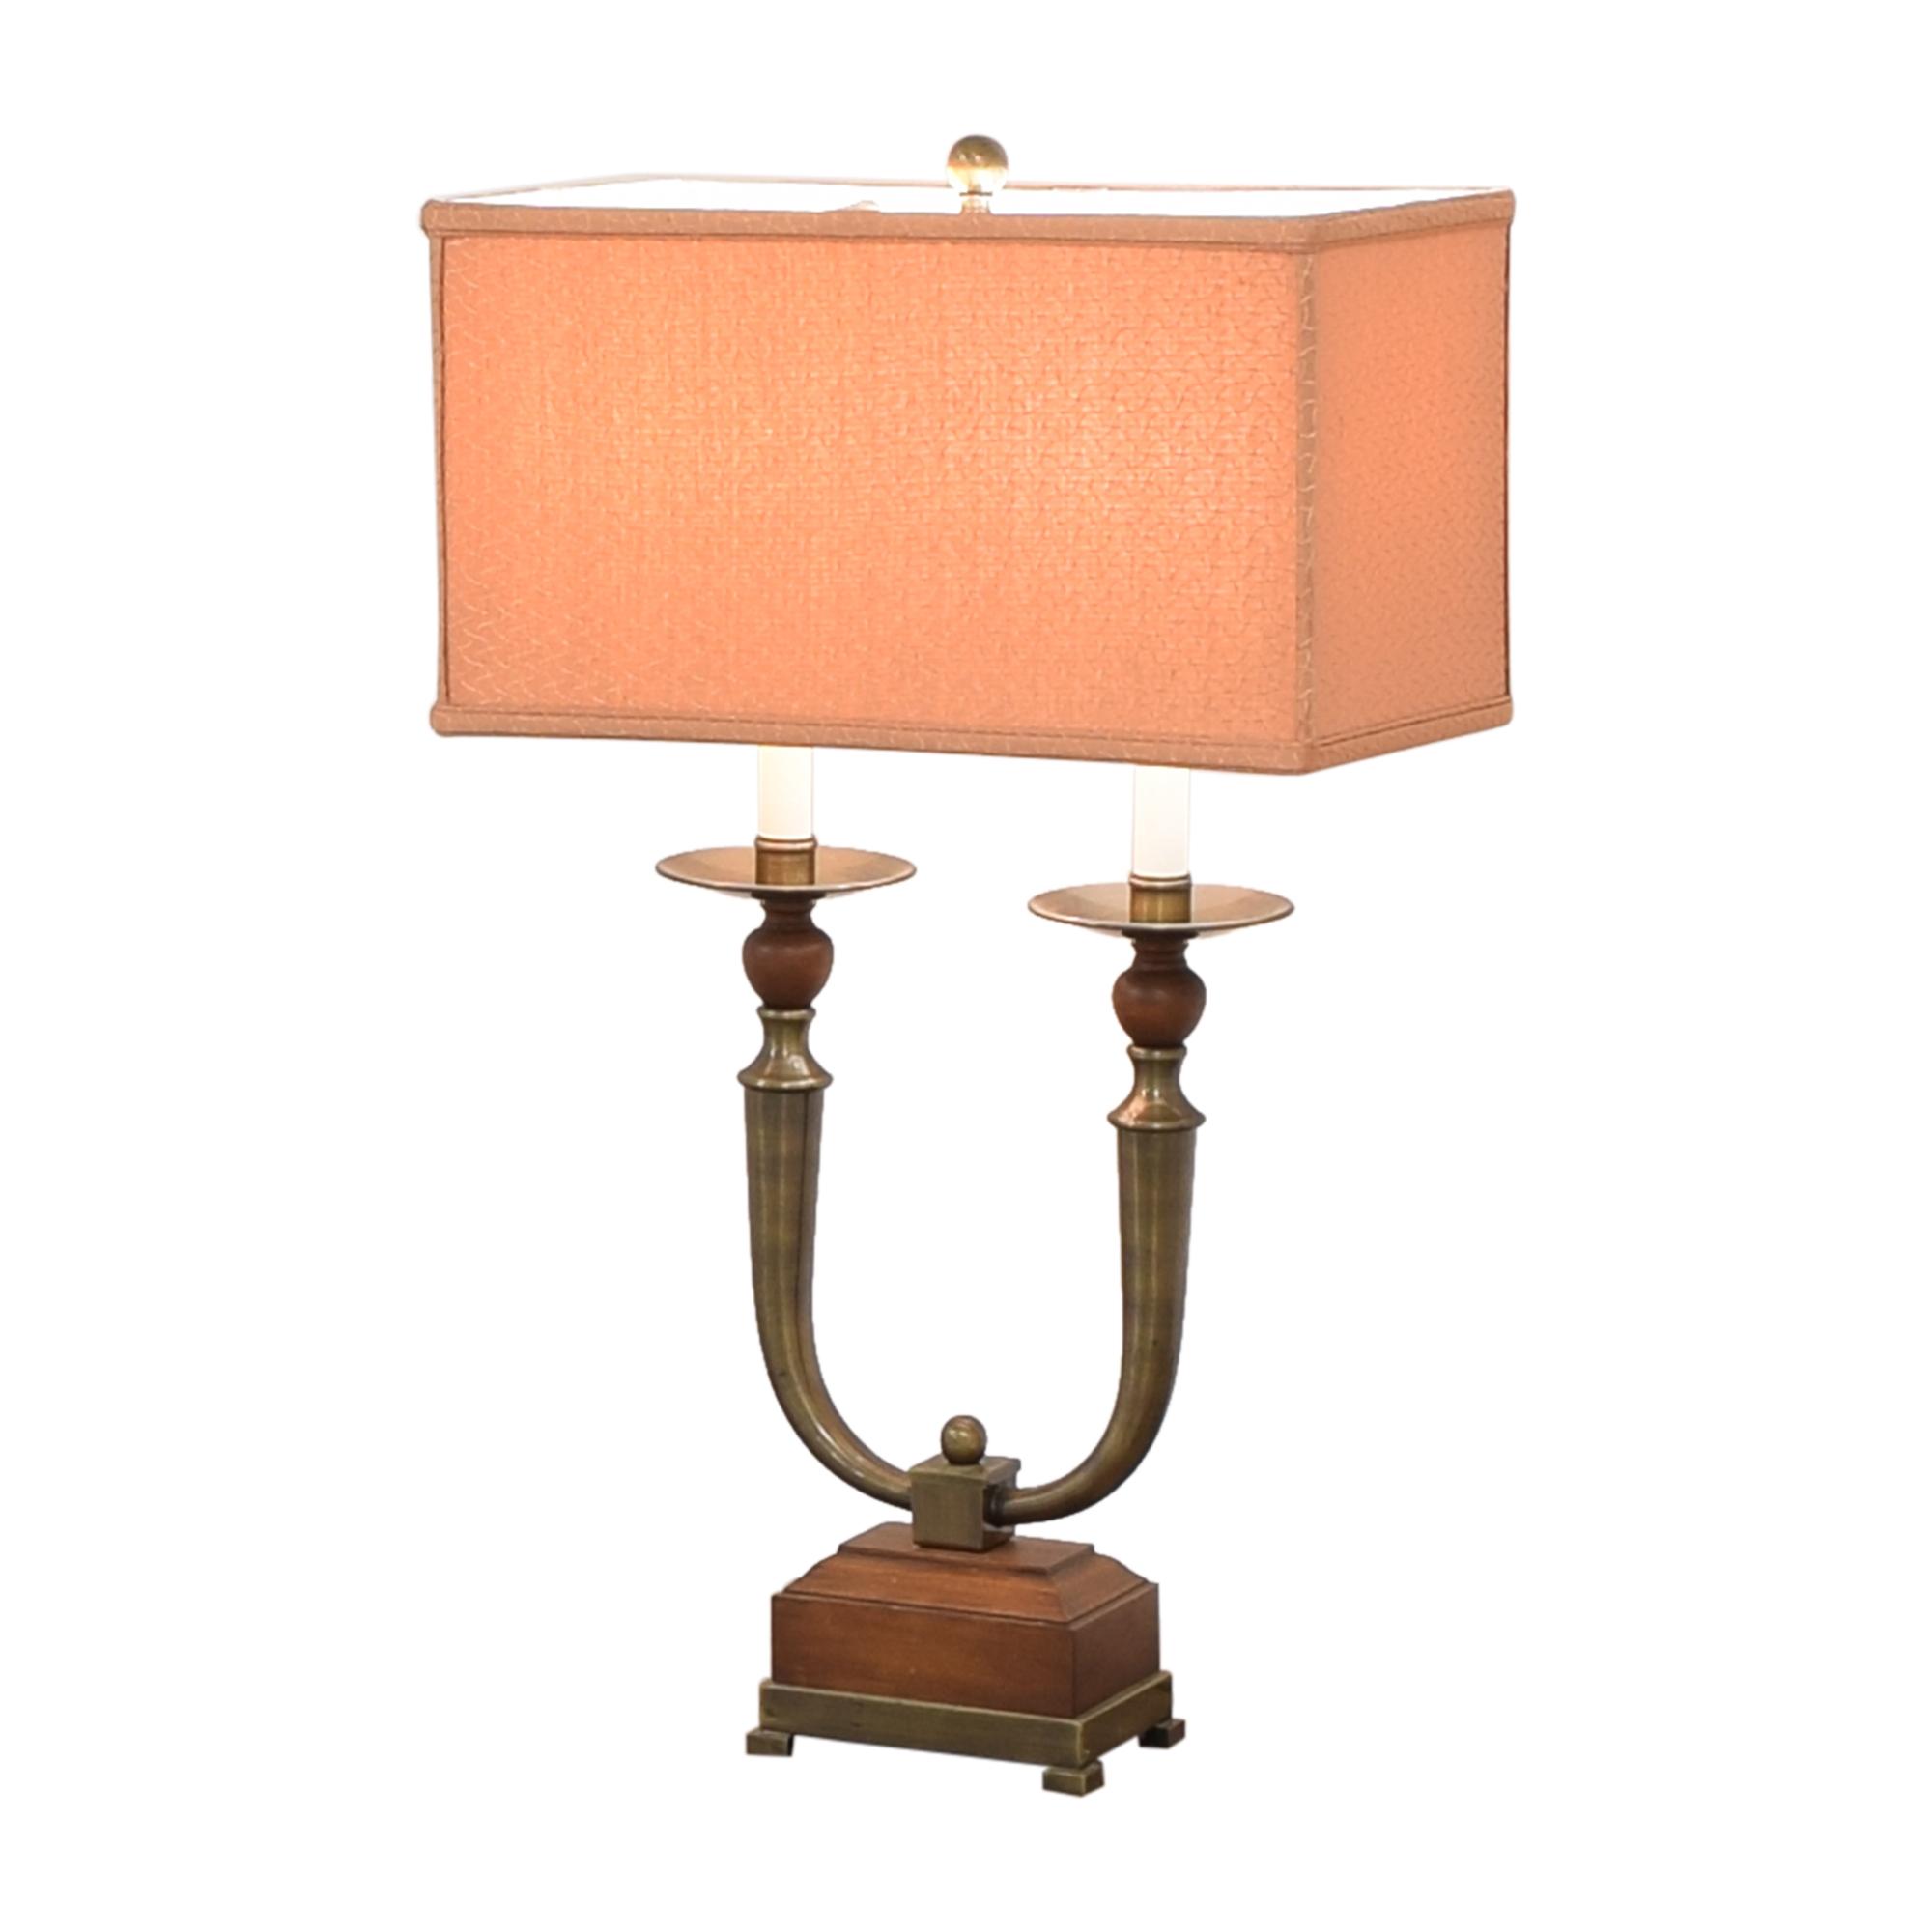 Neiman Marcus Neiman Marcus Table Lamp for sale